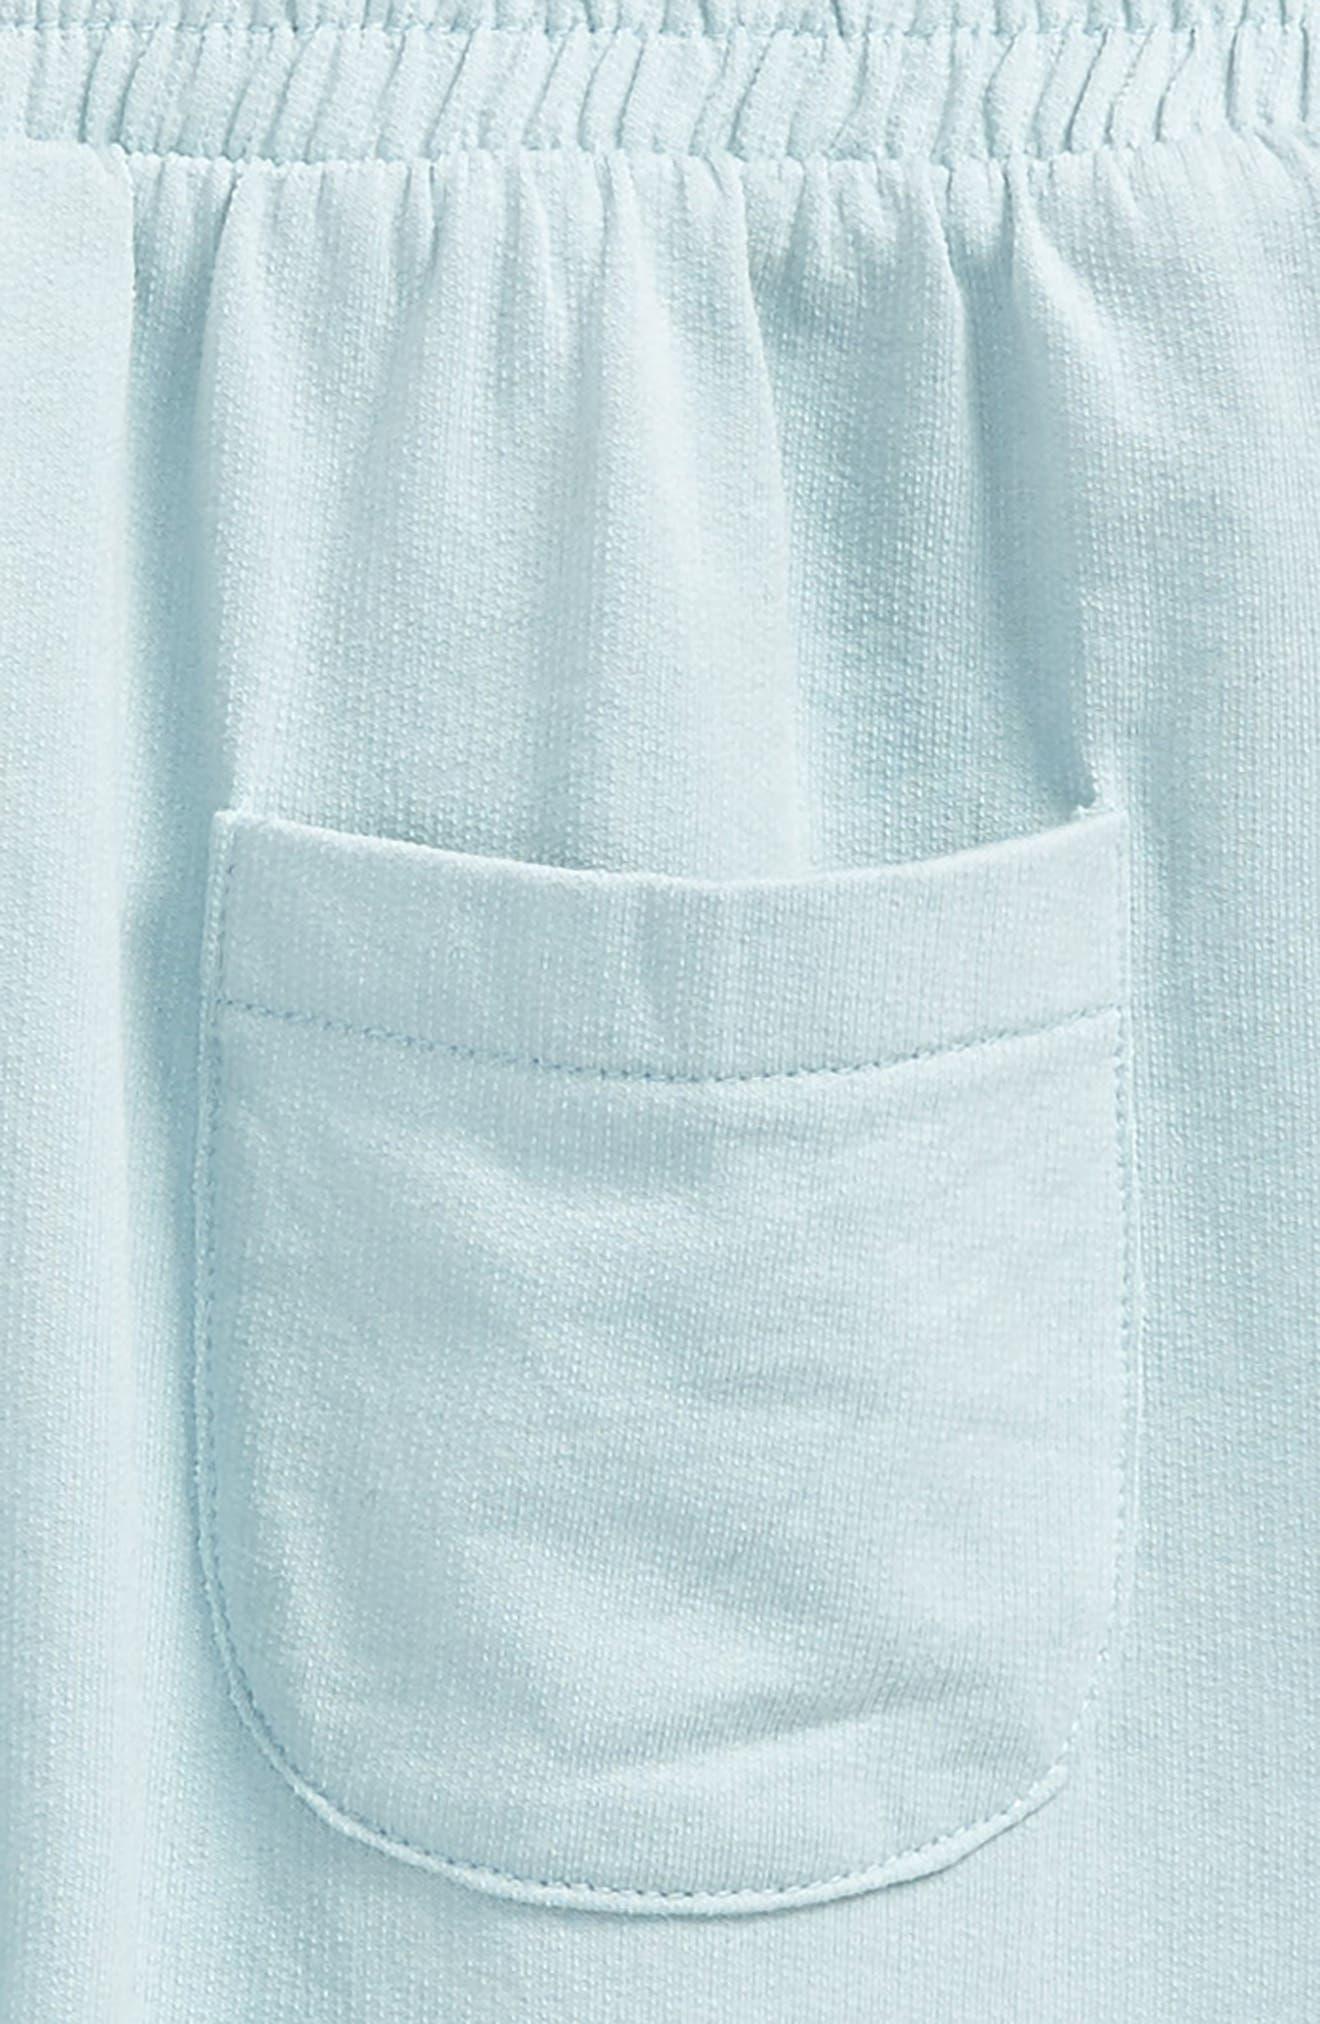 Wide Leg Sweatpants,                             Alternate thumbnail 3, color,                             Blue Sterling